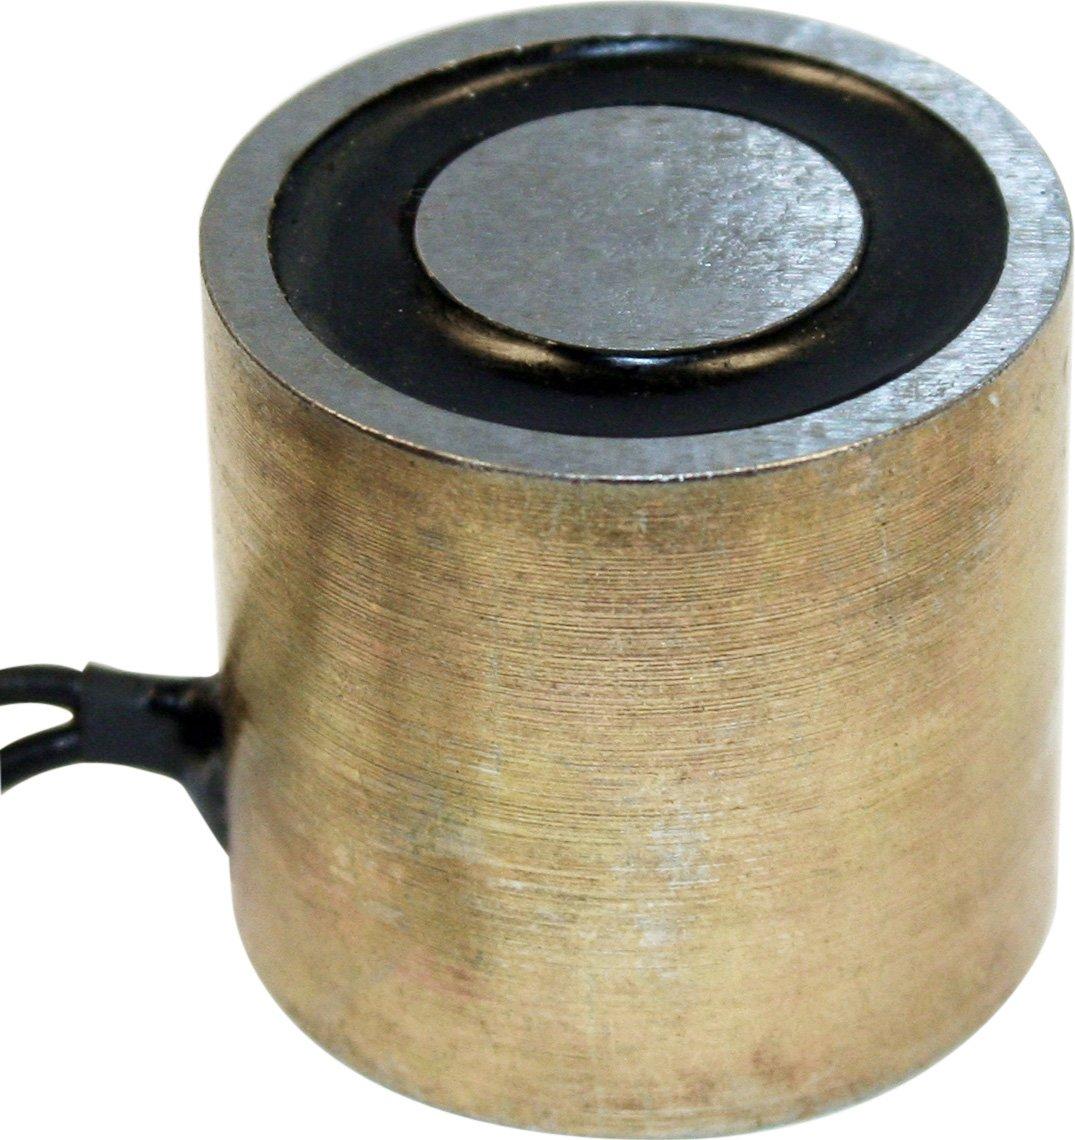 MAG-MATE ER2-303 Round Island Pole Electromagnet, 3 x 3''/25W